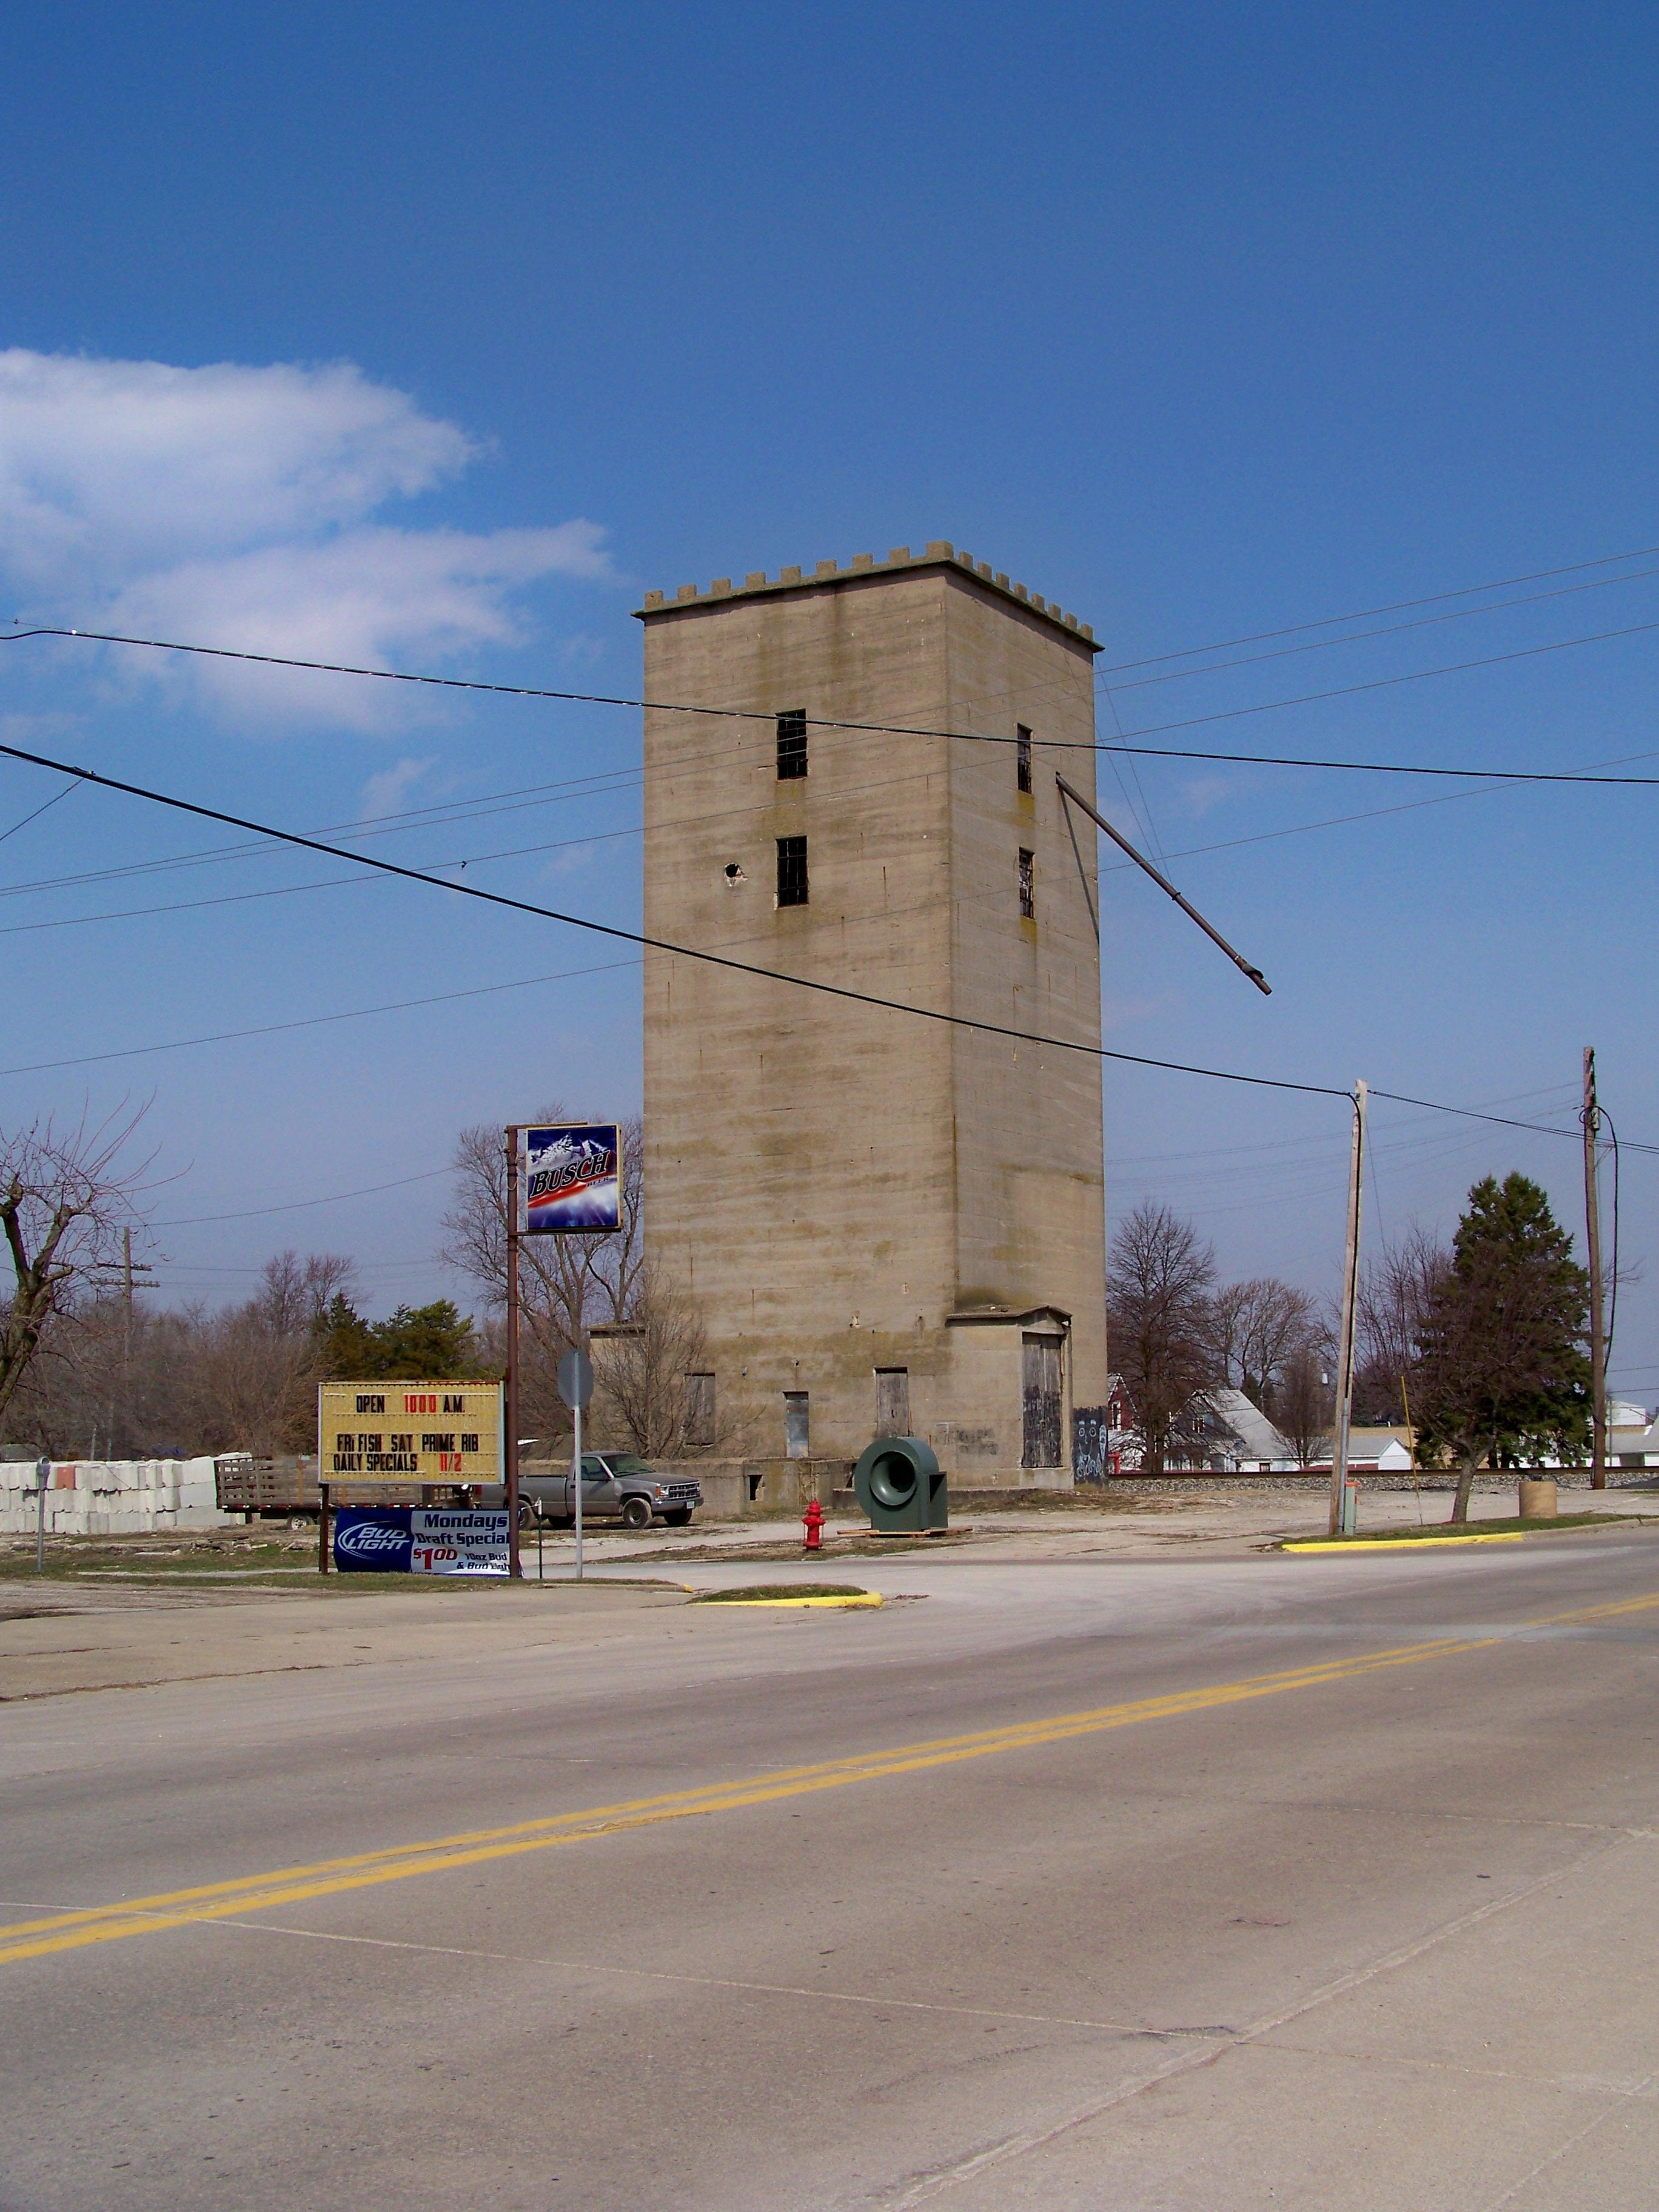 Illinois vermilion county muncie - County Illinois Elevator Grain Fairmount Vermilion